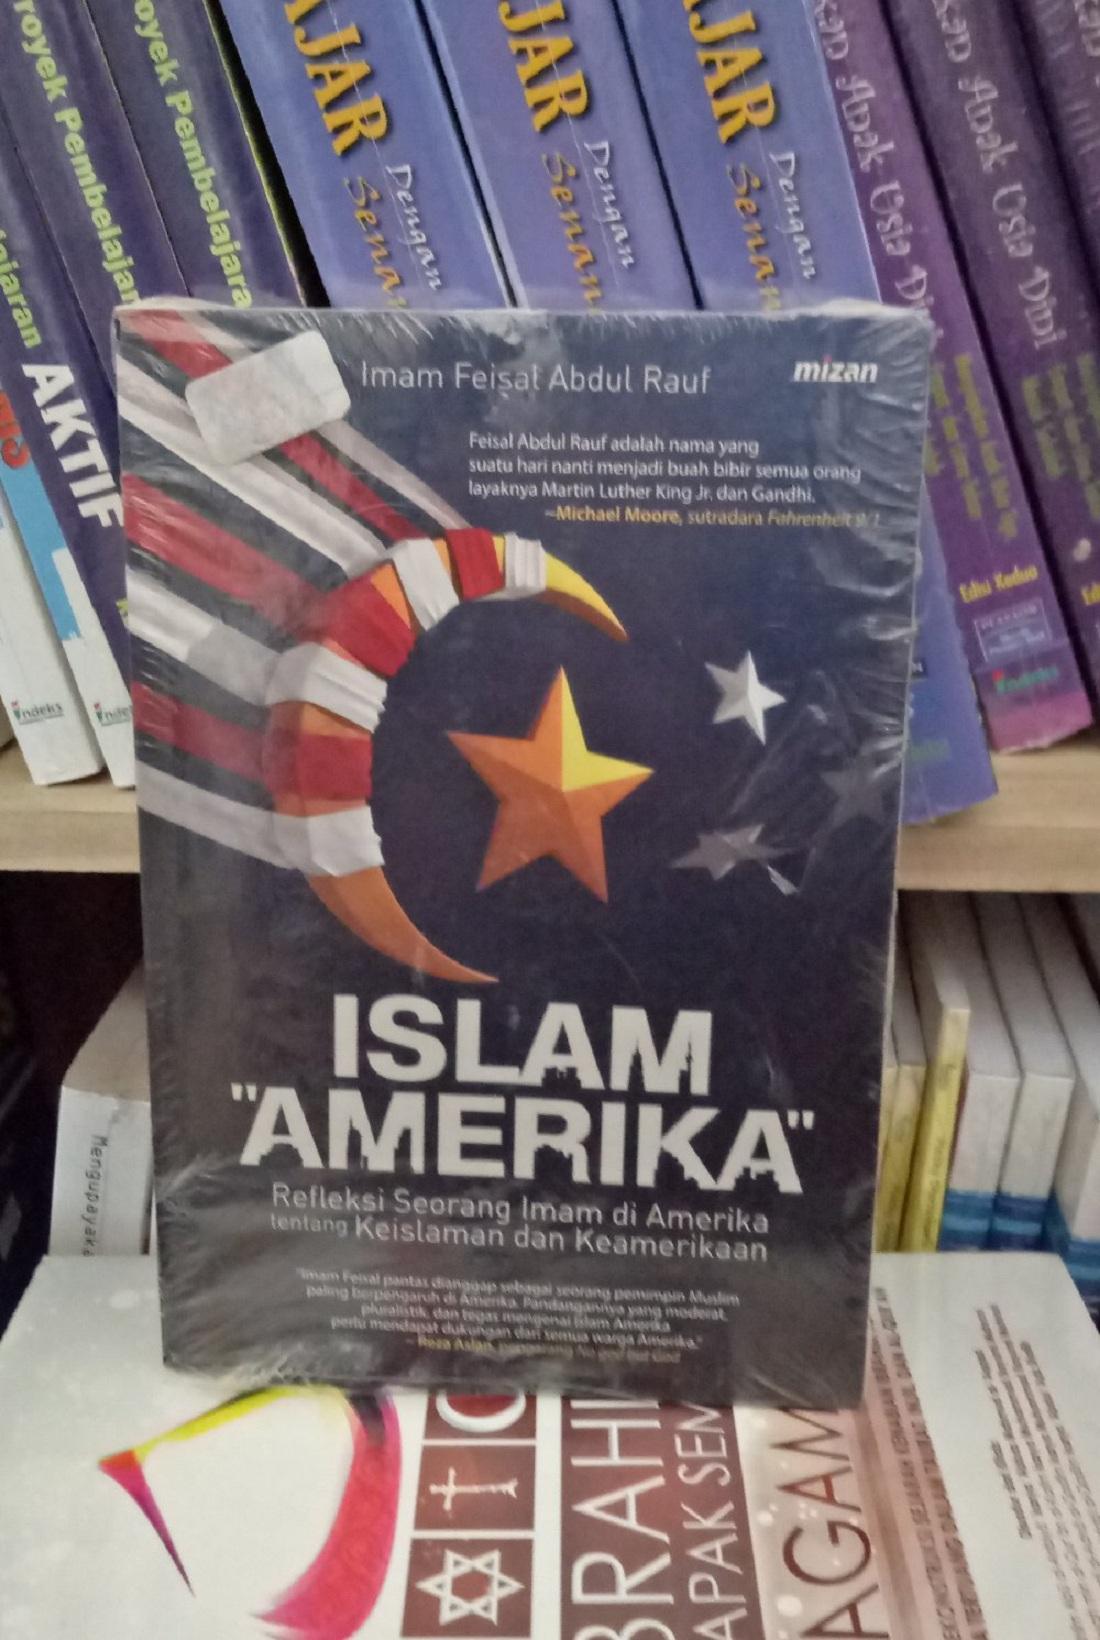 Islam Amerika - Imam Feisal By Metro Bookstore Malang.